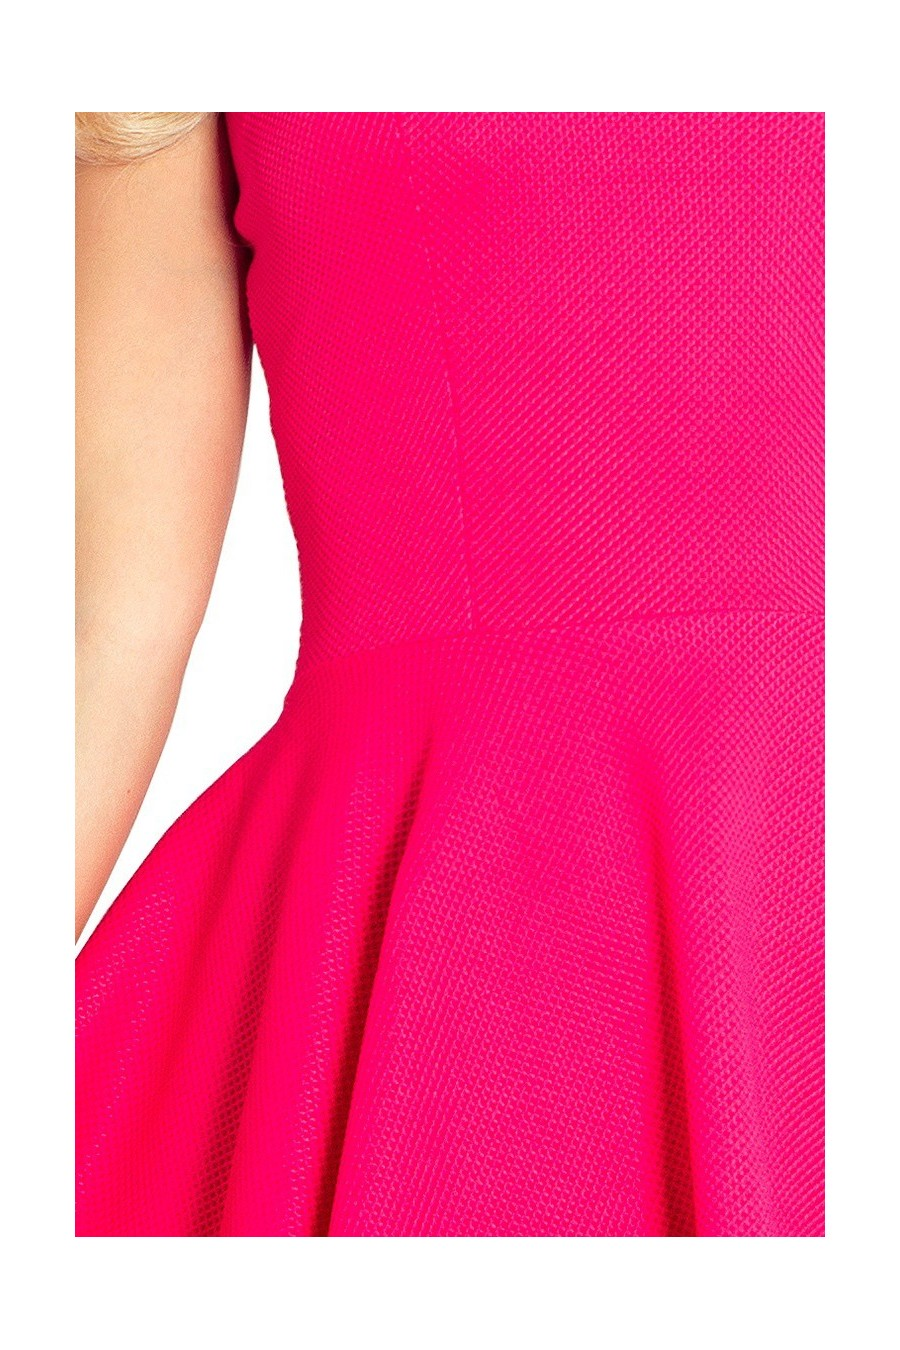 Lacosta - Exclusive asymetrické šaty - ruzova 66-3